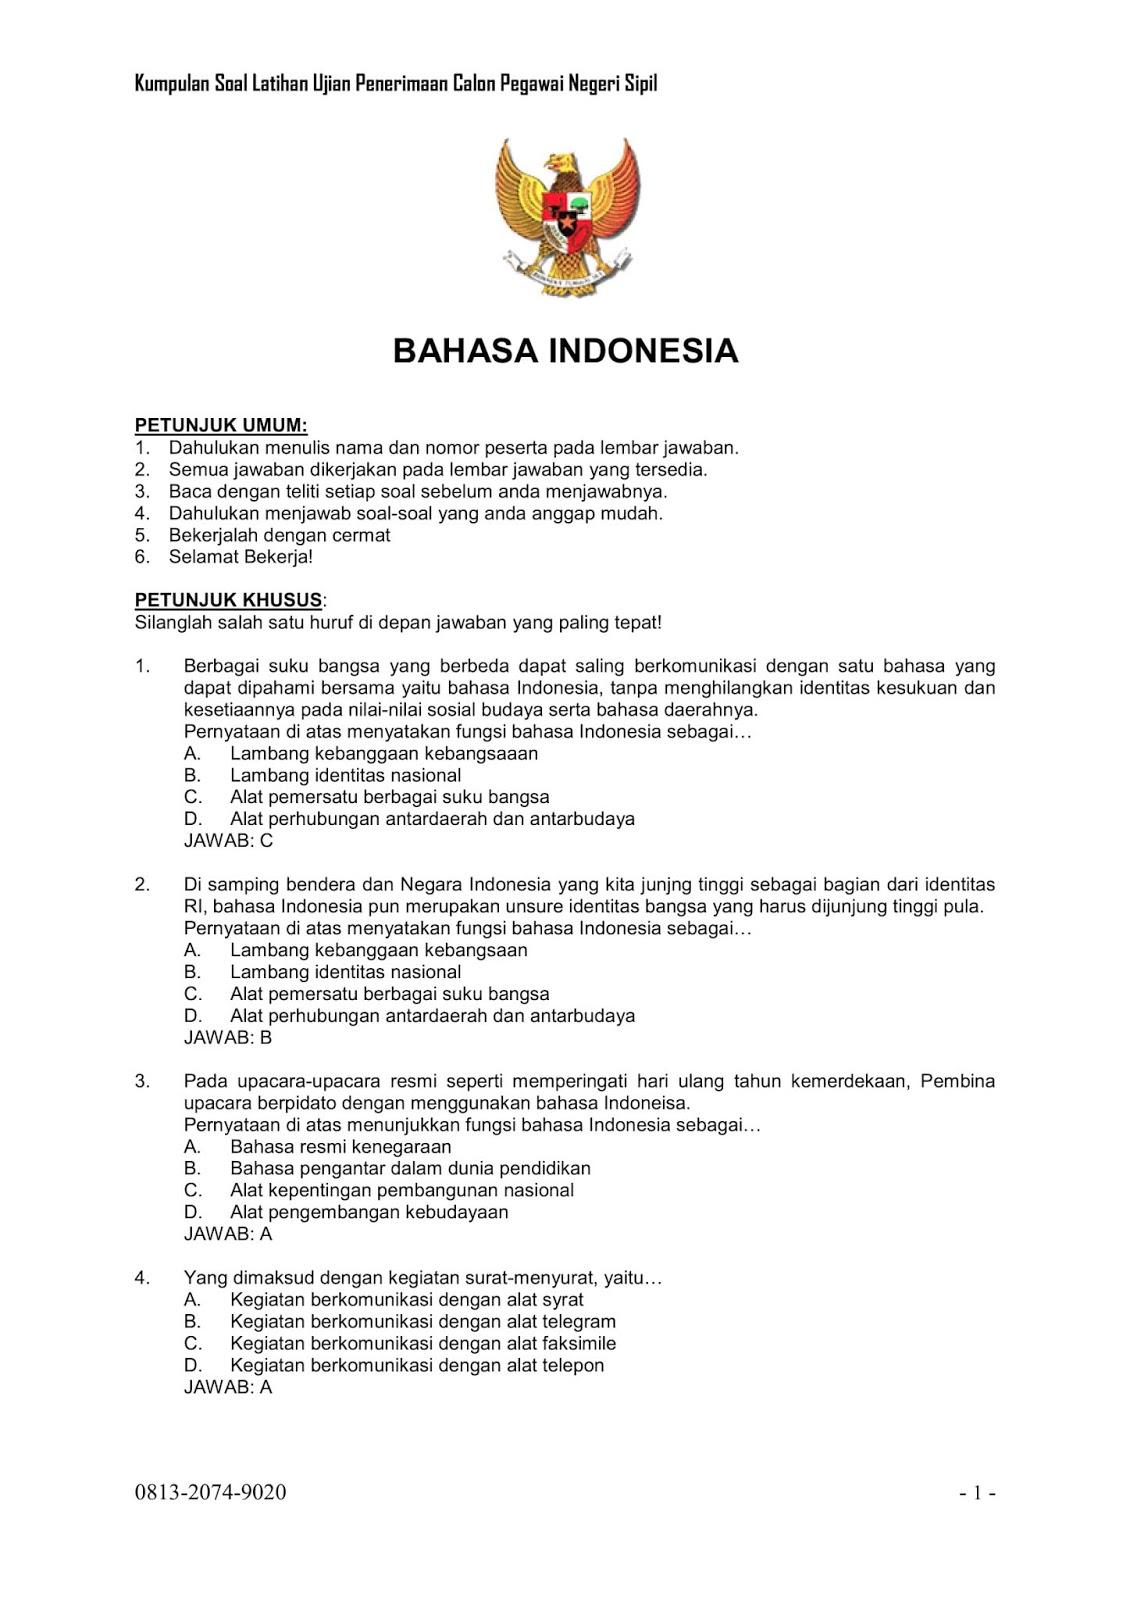 Soal Cpns Indonesia Contoh Soal